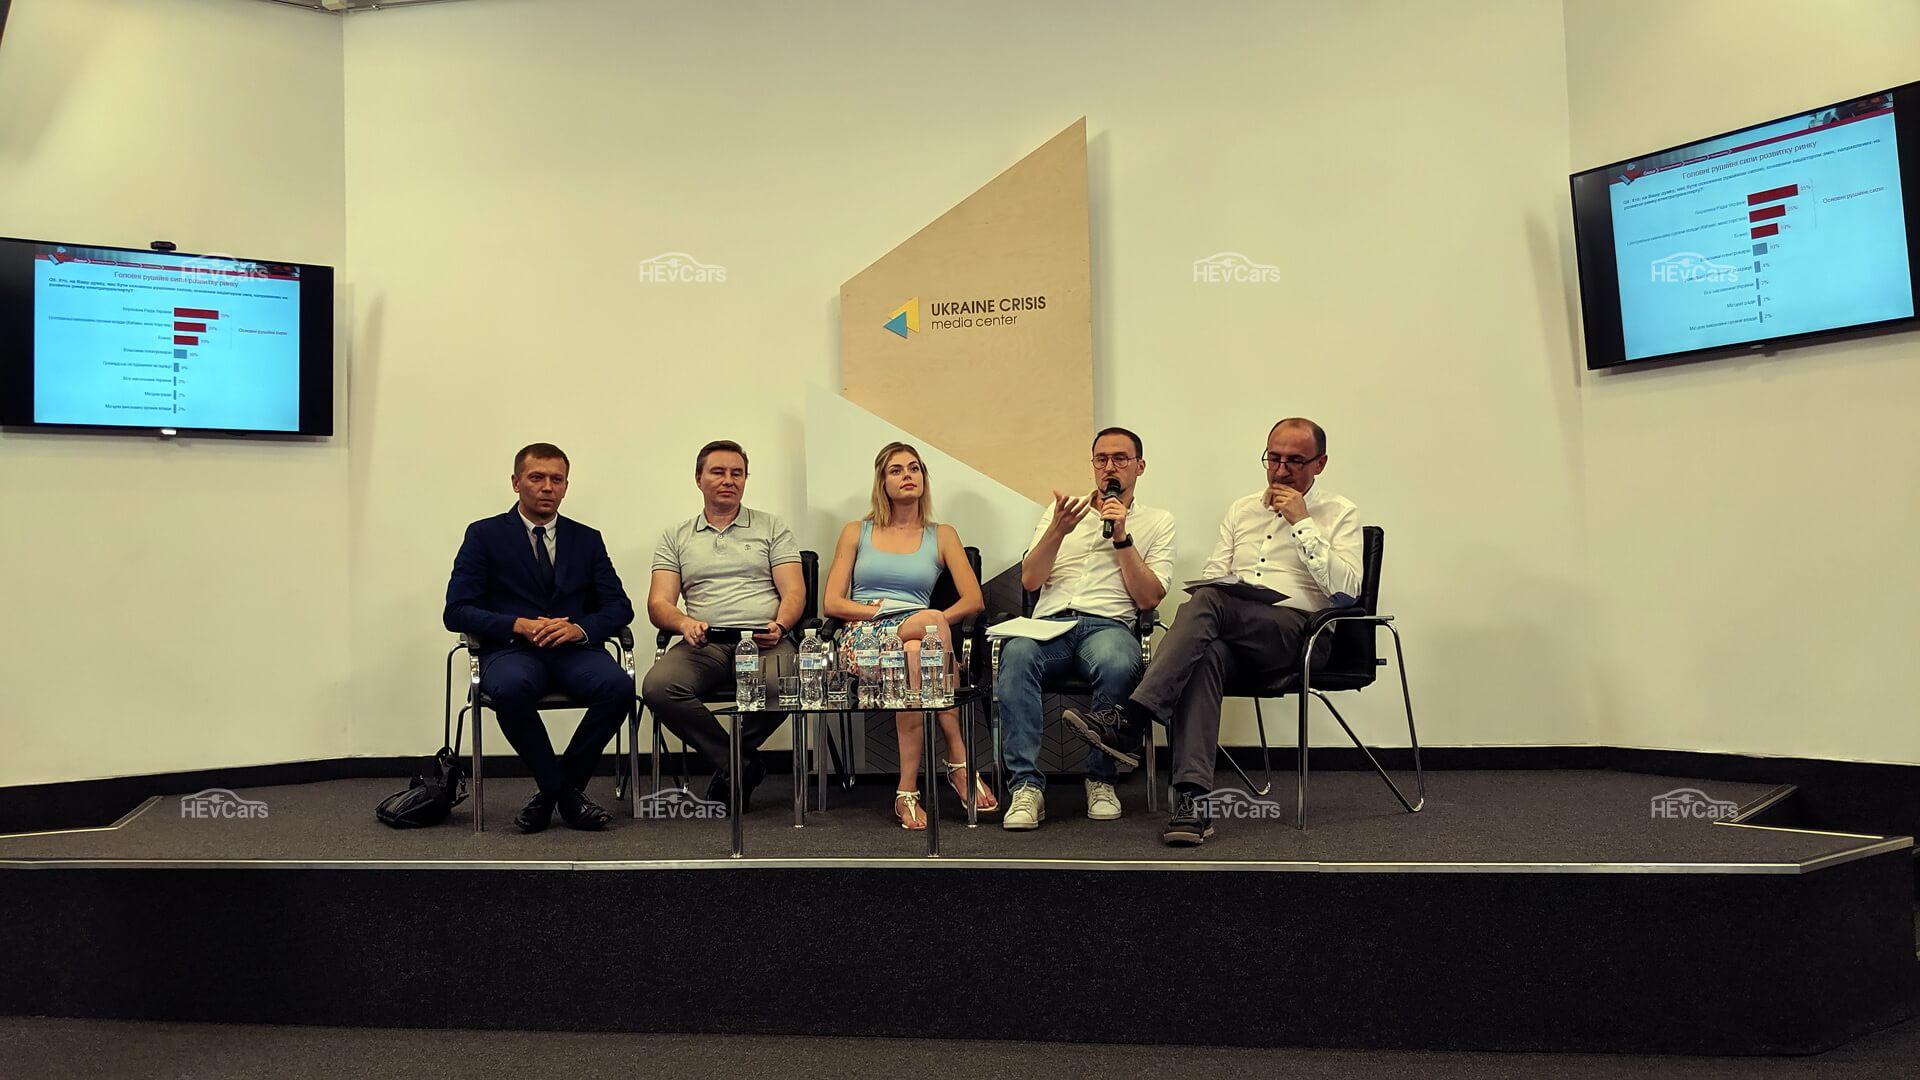 Слева направо: Виталий Годун - Арсений Абдураимов - Марина Кытина - Алексей Рябчин - Иван Любарский